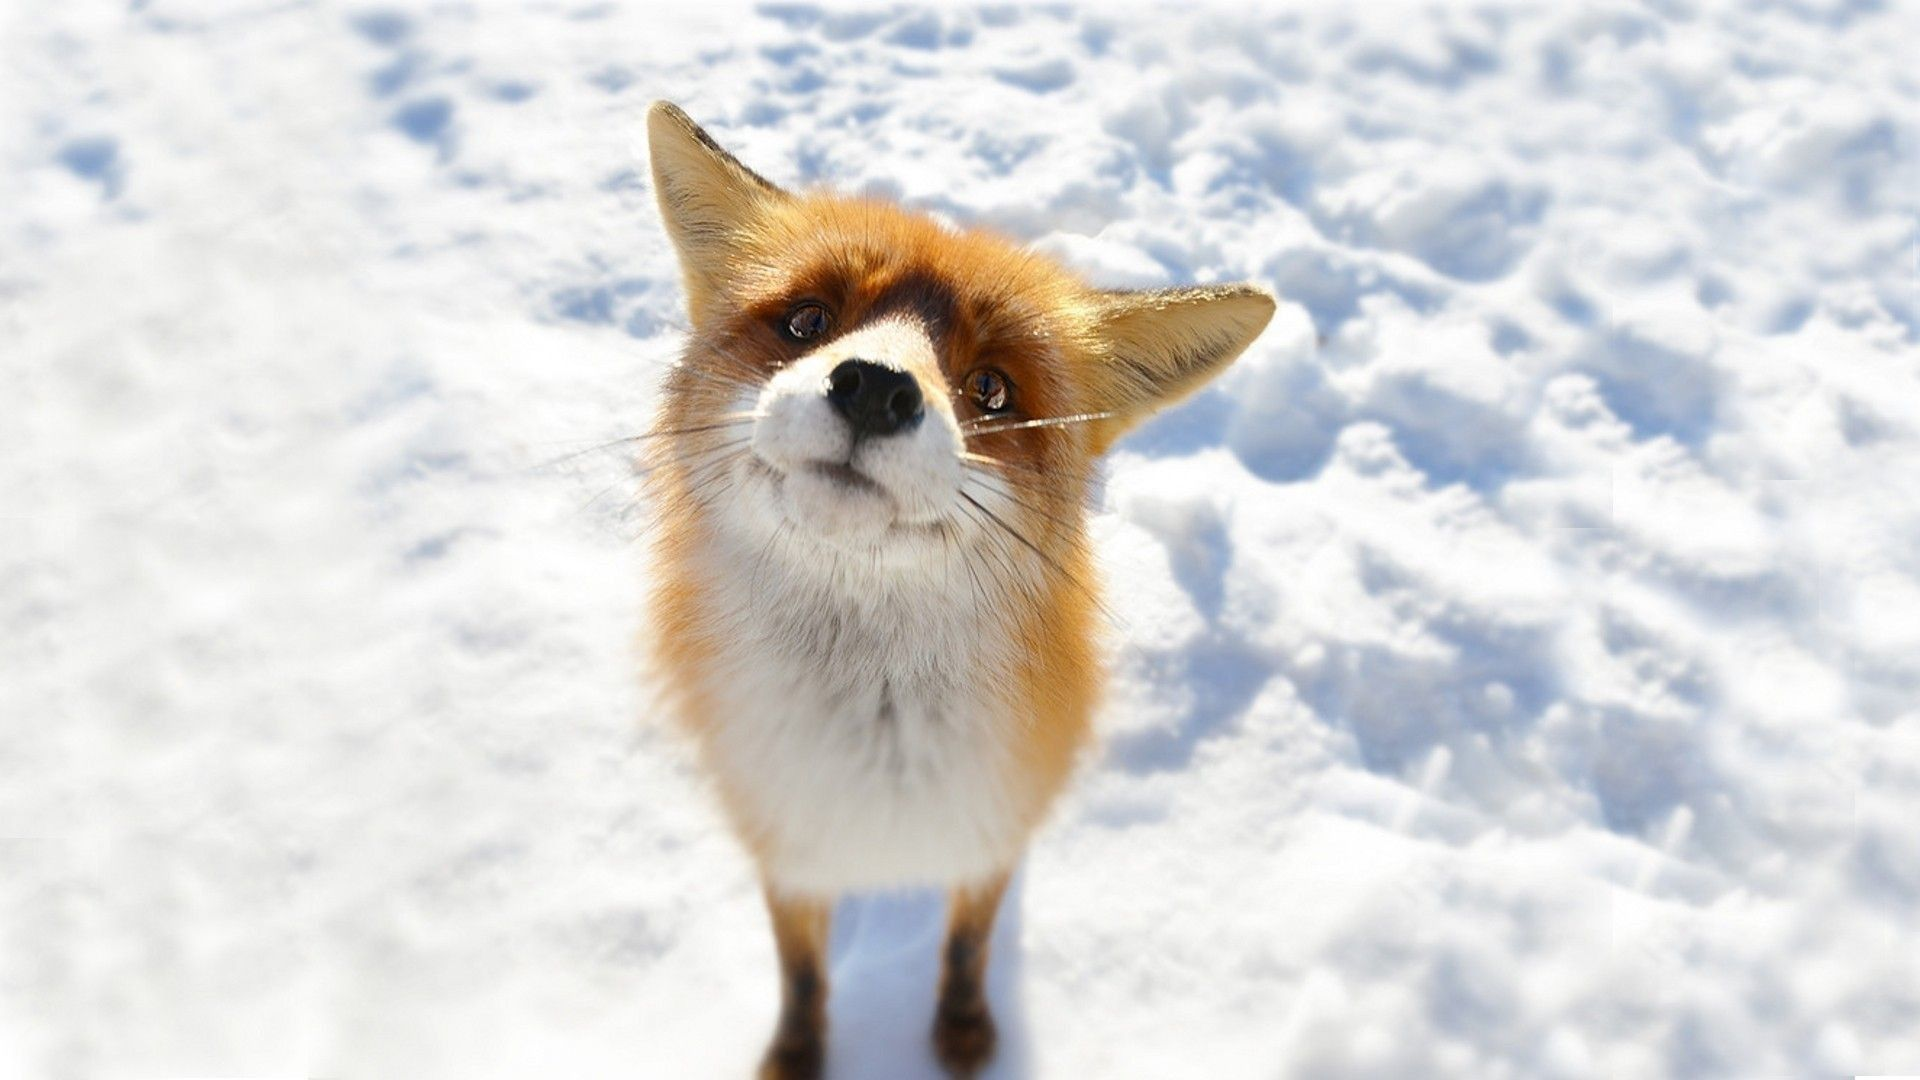 Cute Winter Animal Wallpaper 1920x1080 For Windows 10 Cute Animals Pet Fox Cute Baby Animals